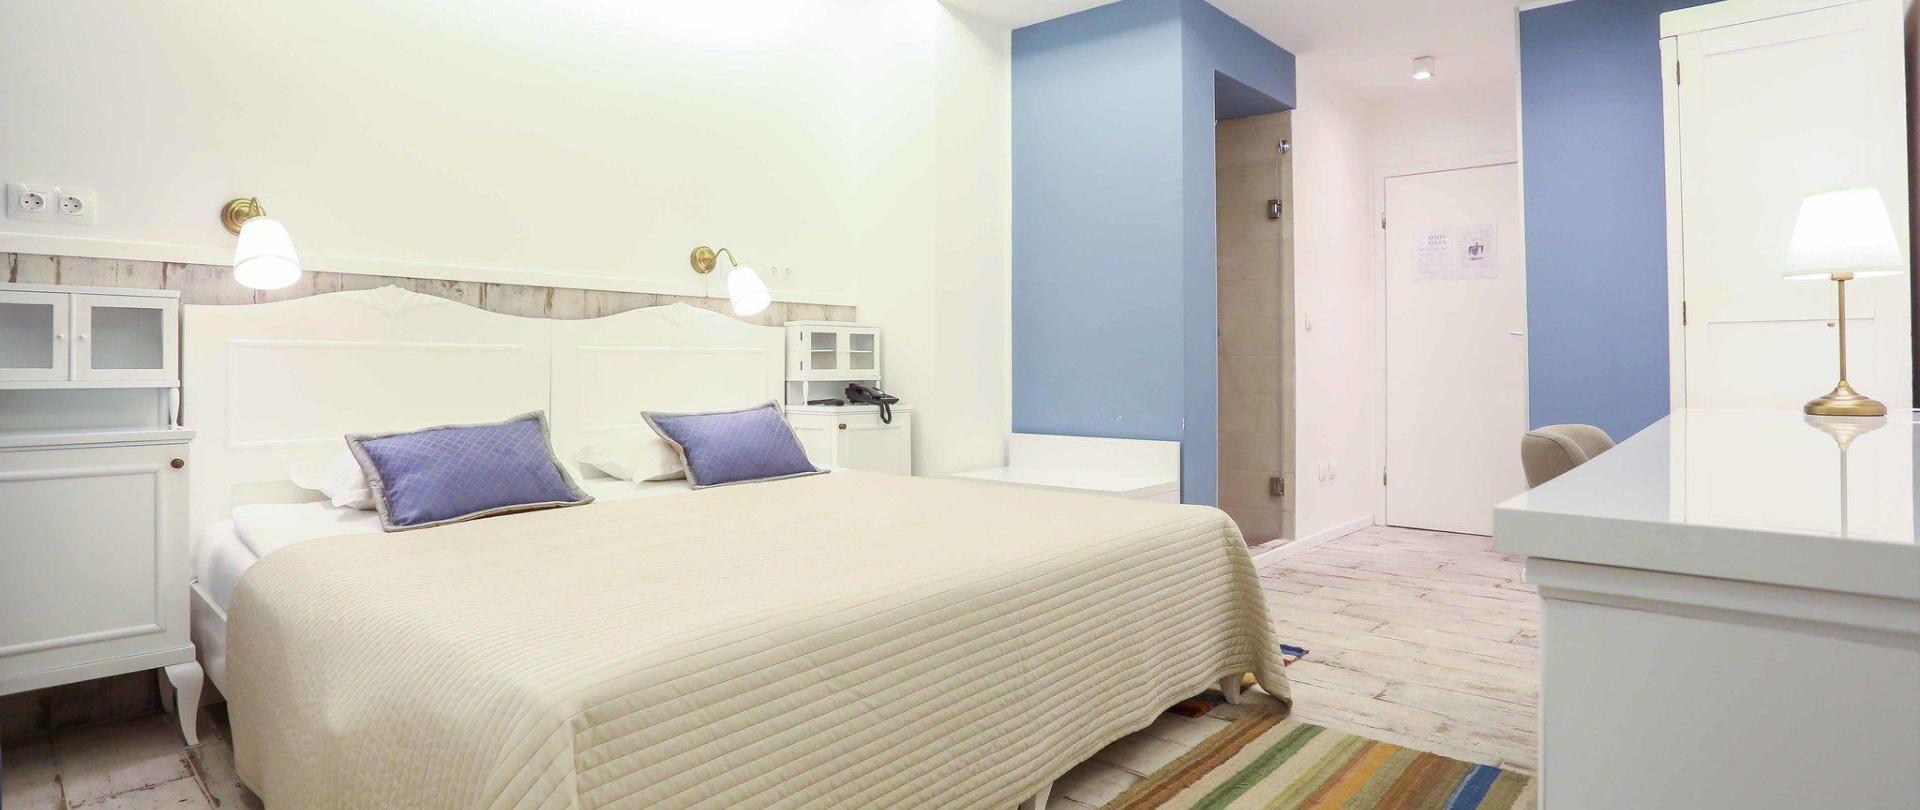 hotel-divan-by-dzenat-drekovic-29-08-2016-18.jpg